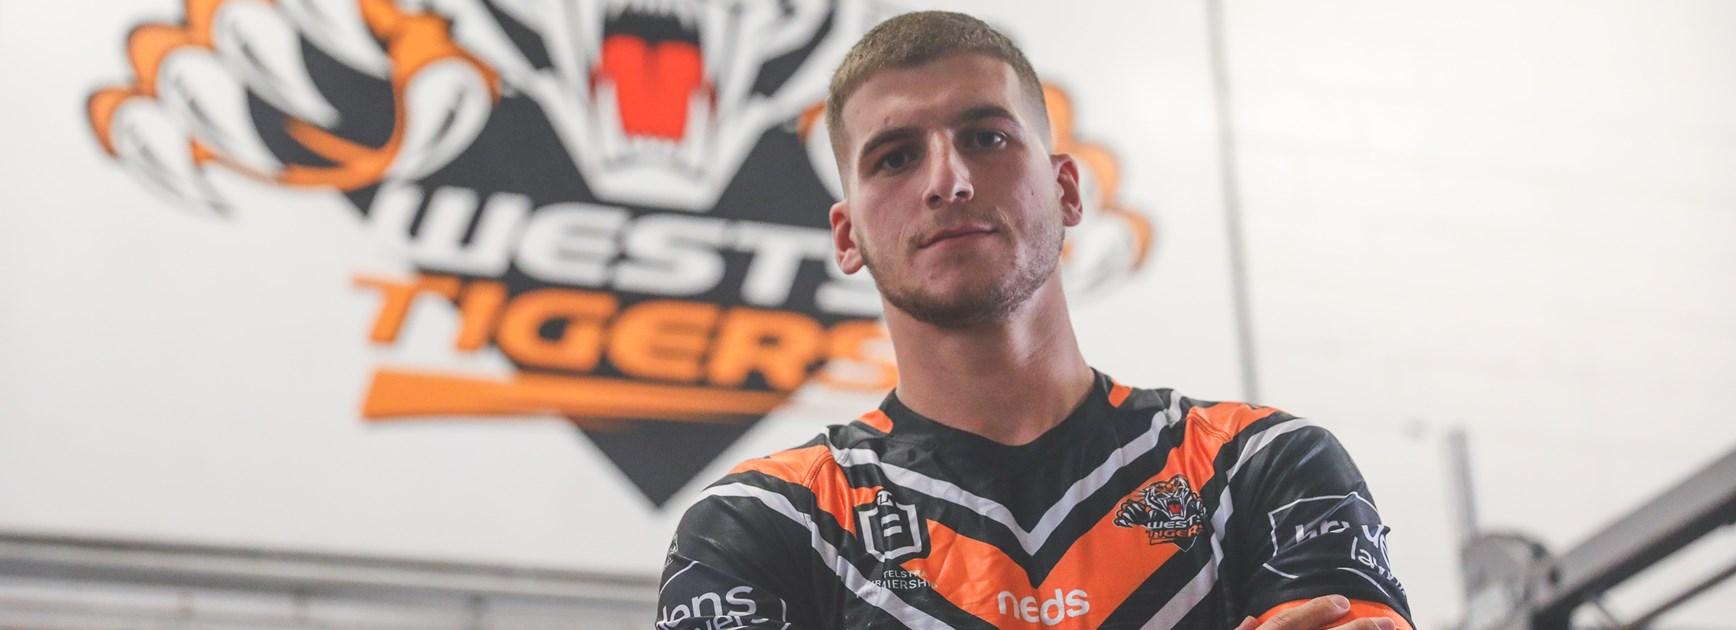 Wests Tigers recruit Adam Doueihi.